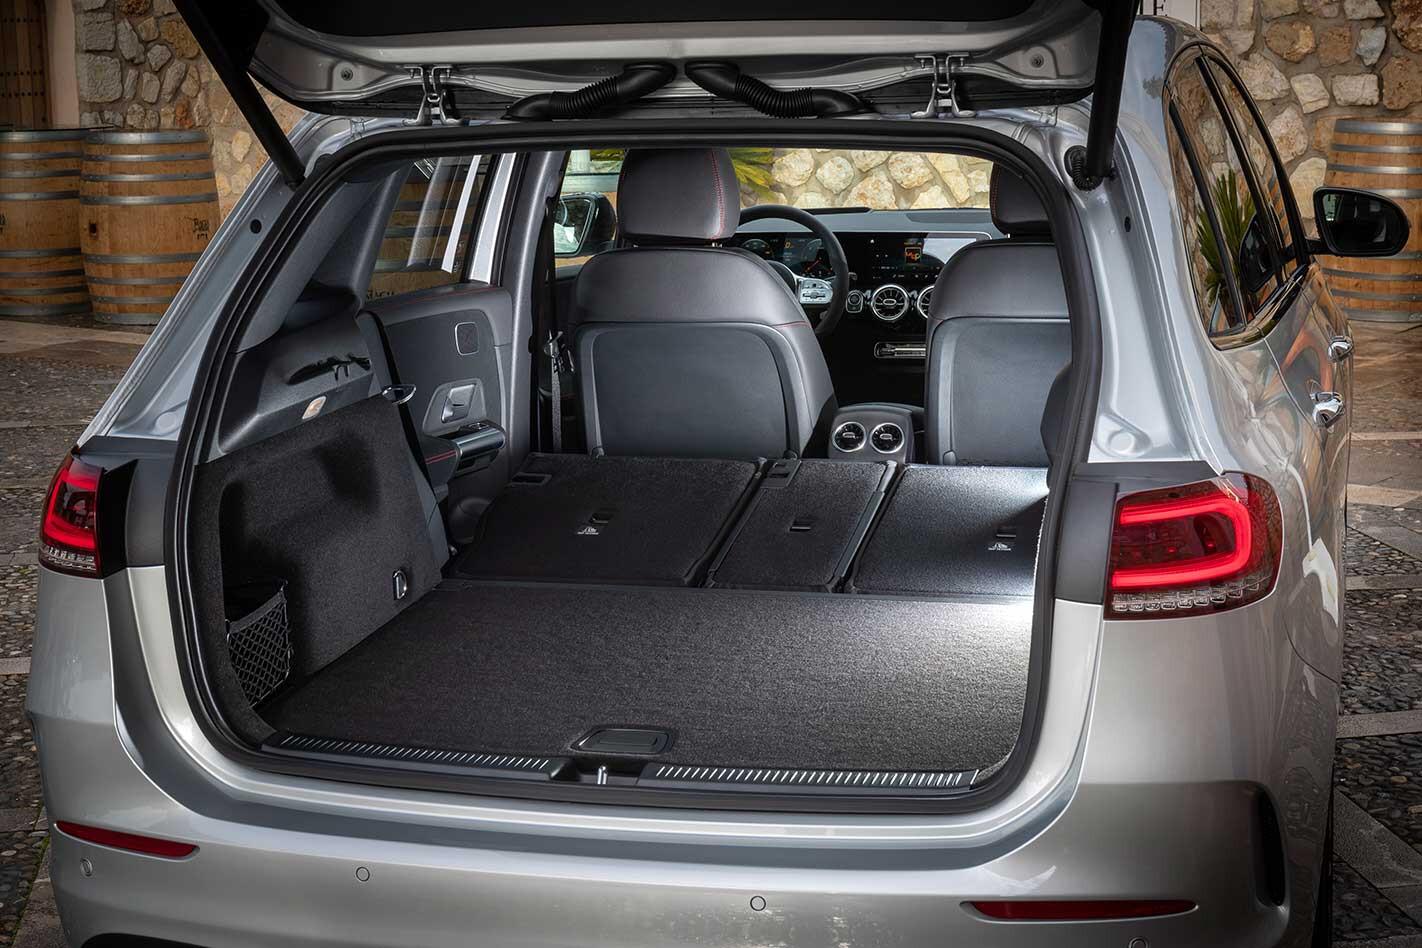 2019 Mercedes Benz B Class Luggage Space 281 29 Jpg